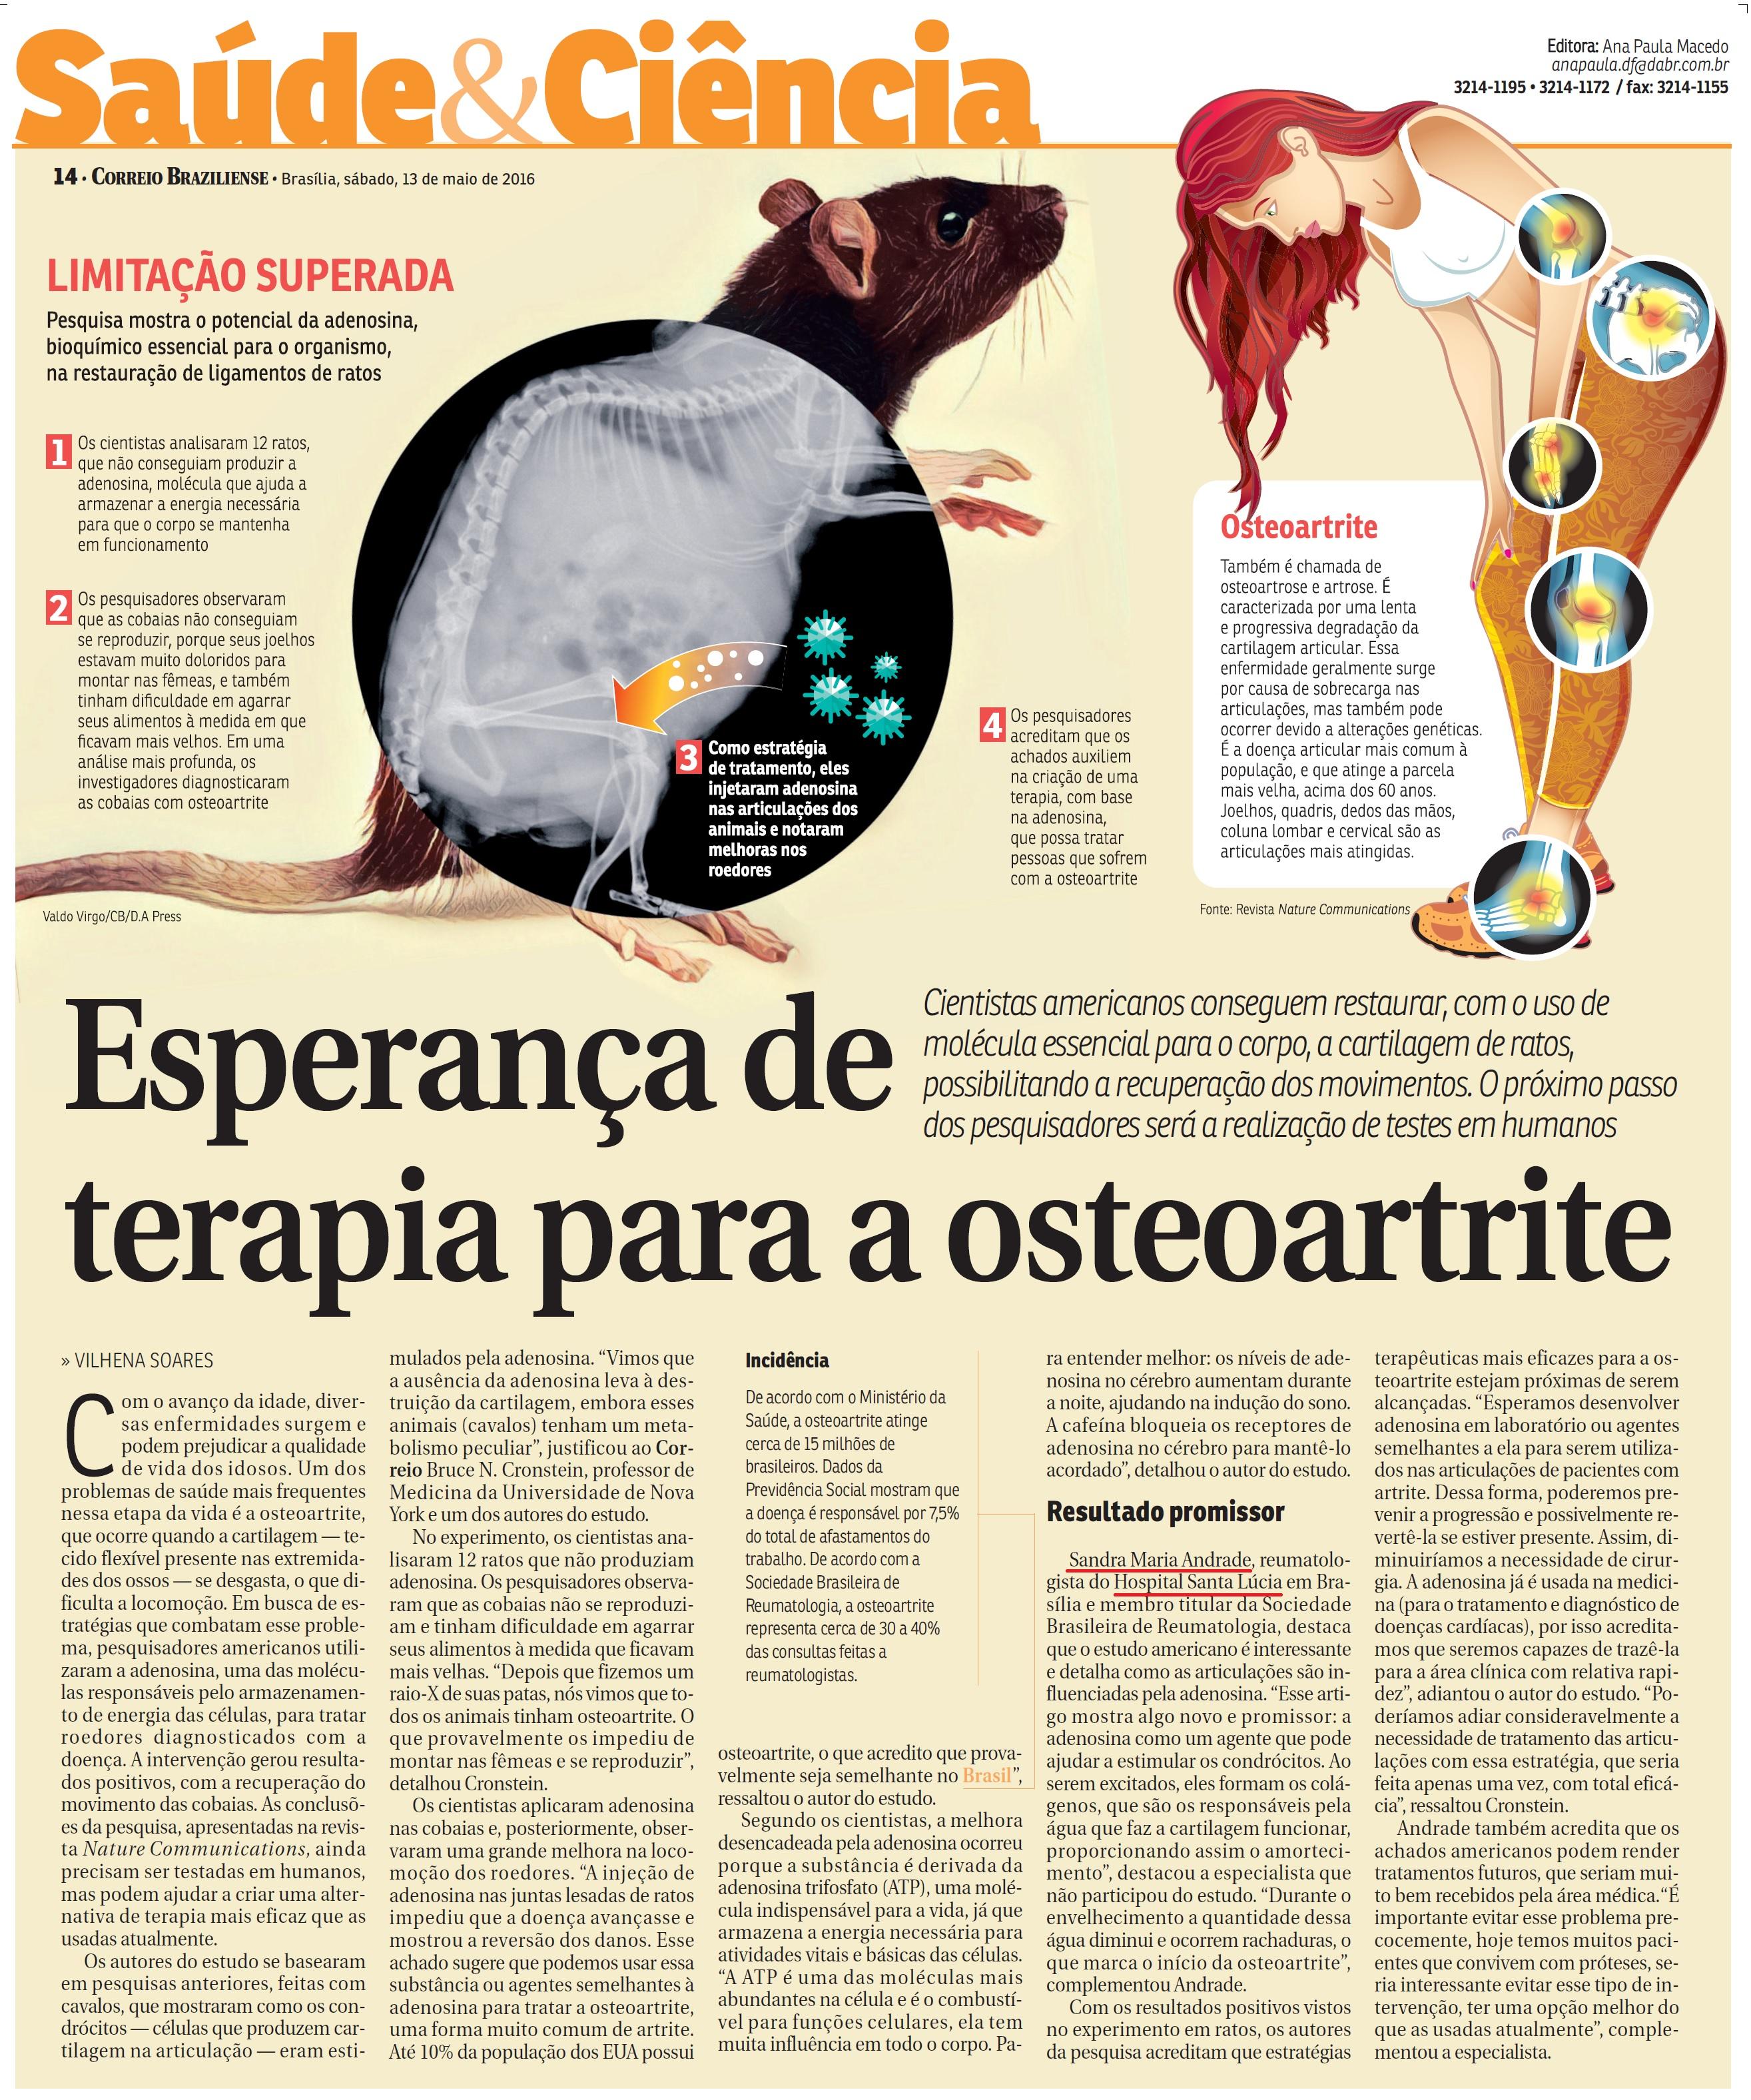 Correio Braziliense - Dra. Sandra Andrade HSL - 13-05-2017